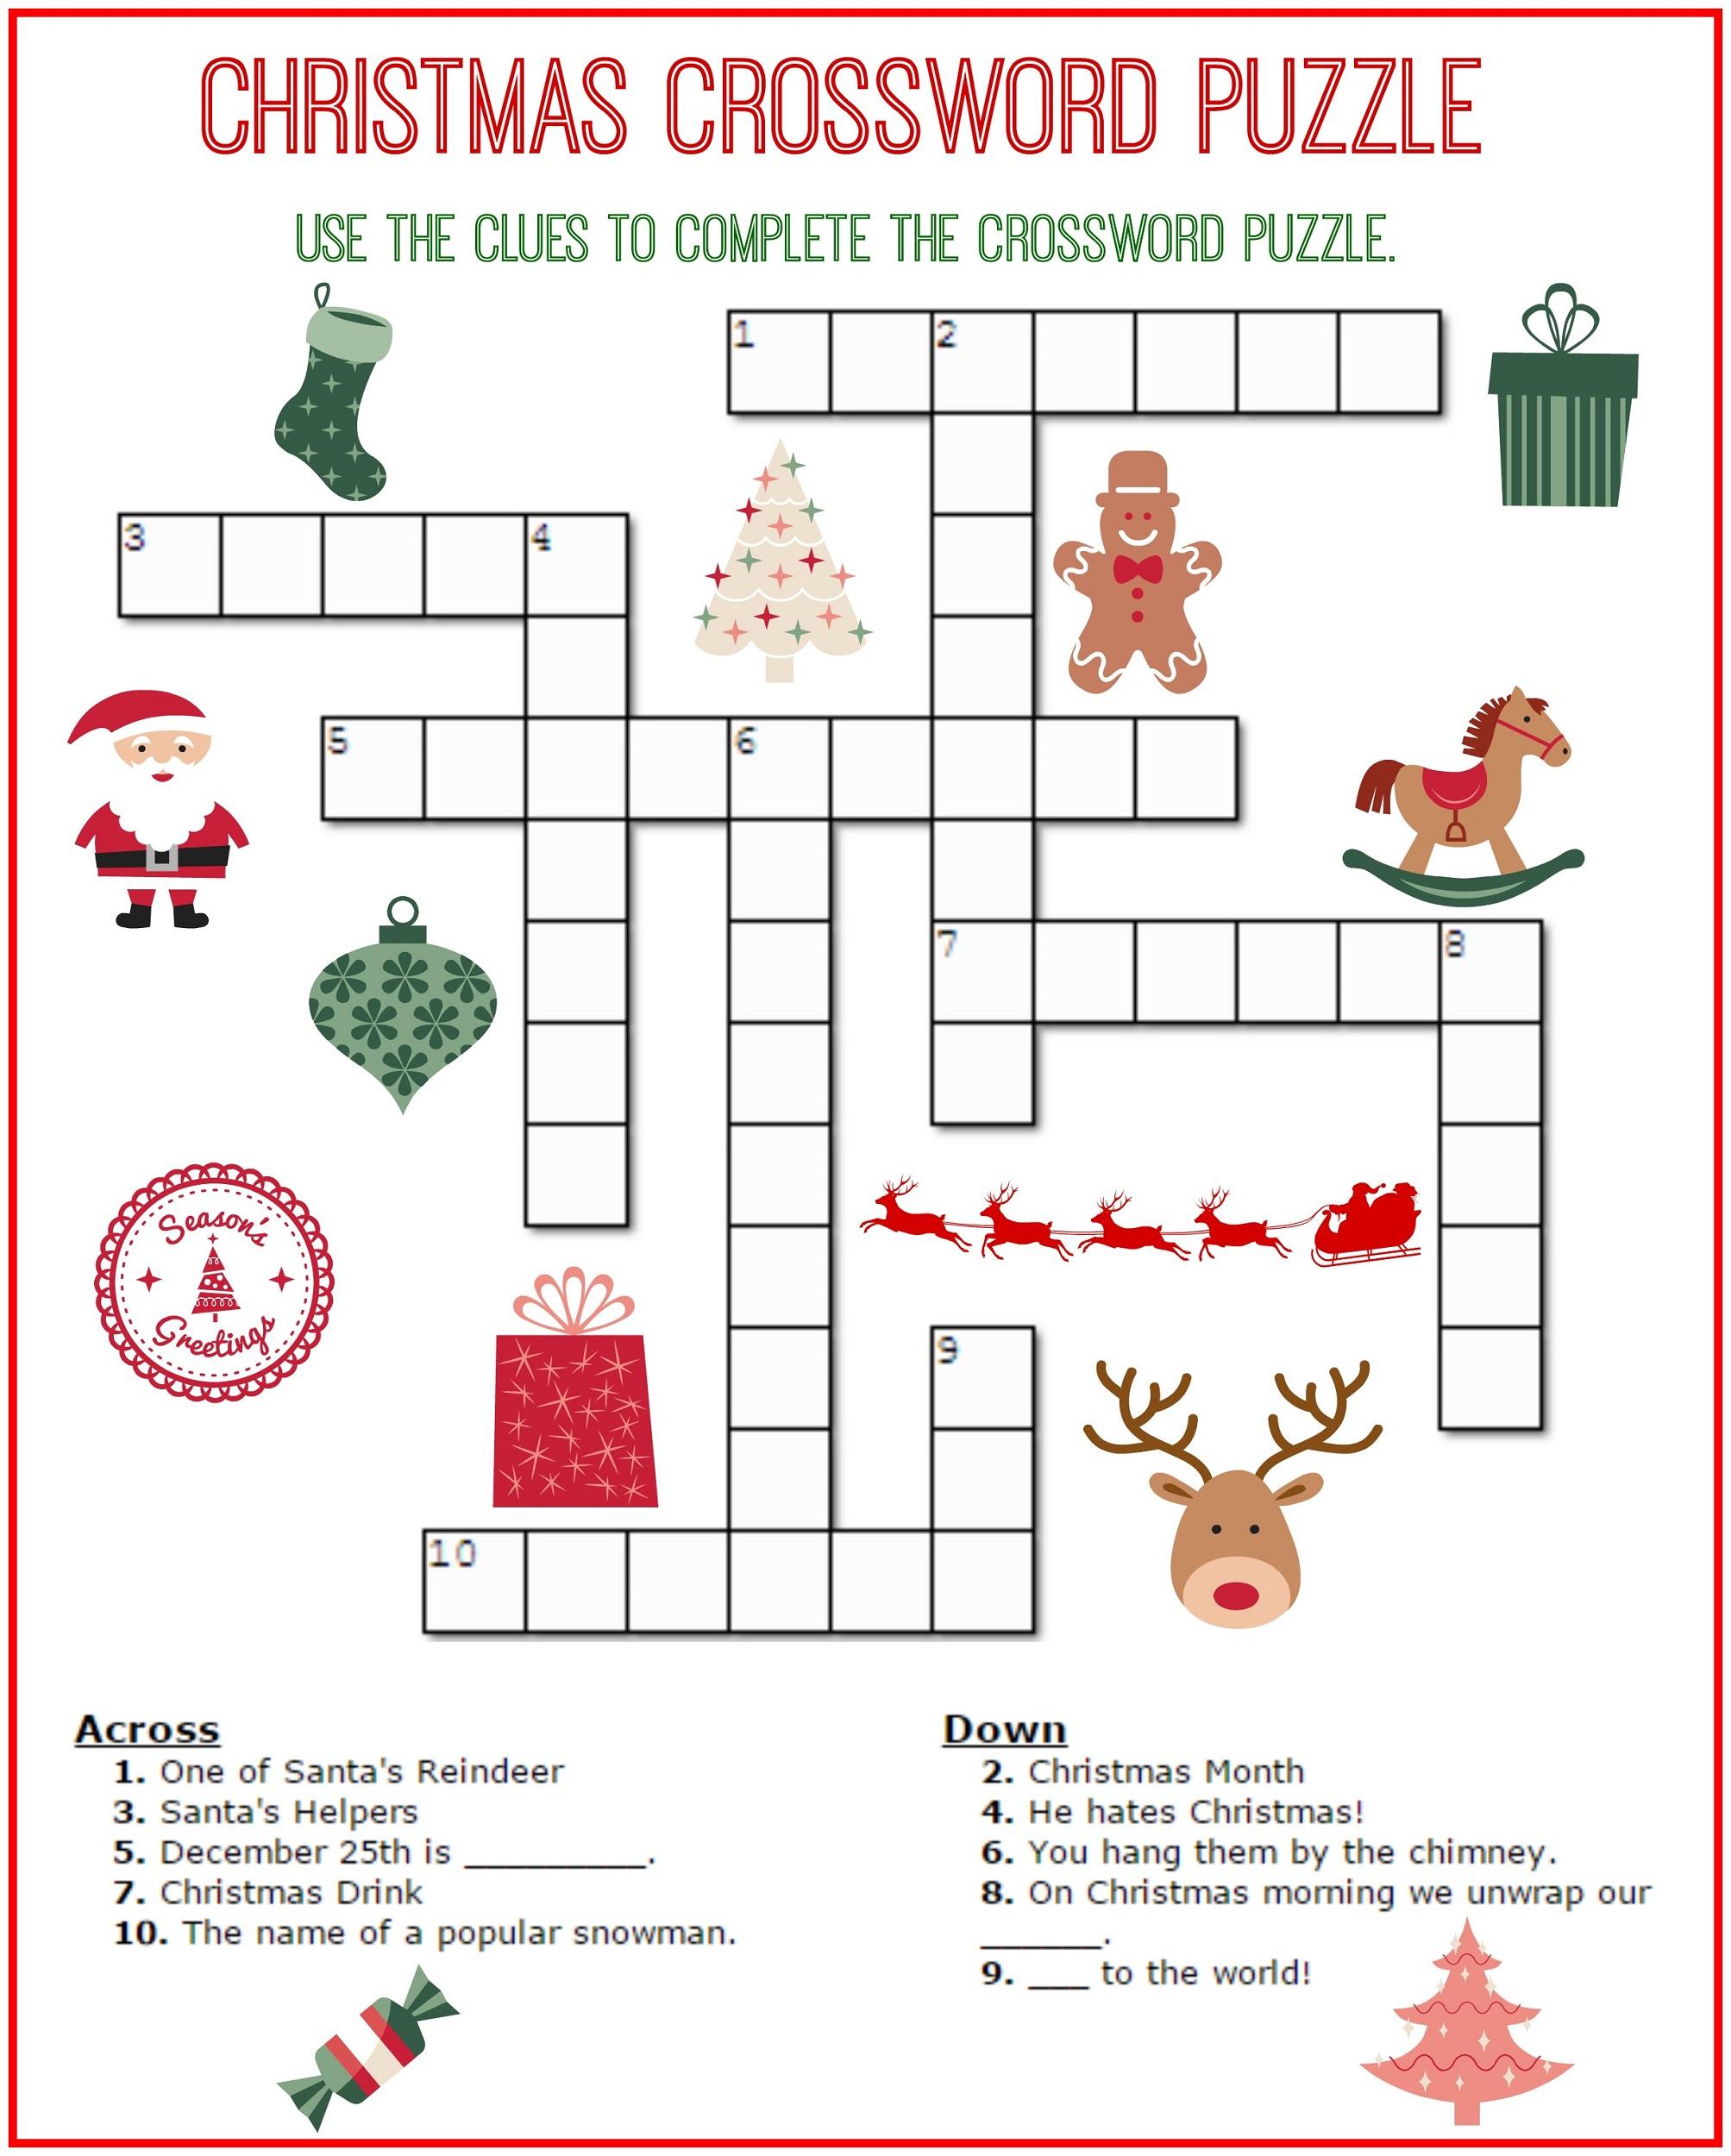 Crossword Puzzle Kids Printable 2017 | Kiddo Shelter - Free Easy - Printable Crossword Puzzles For 6 Year Olds